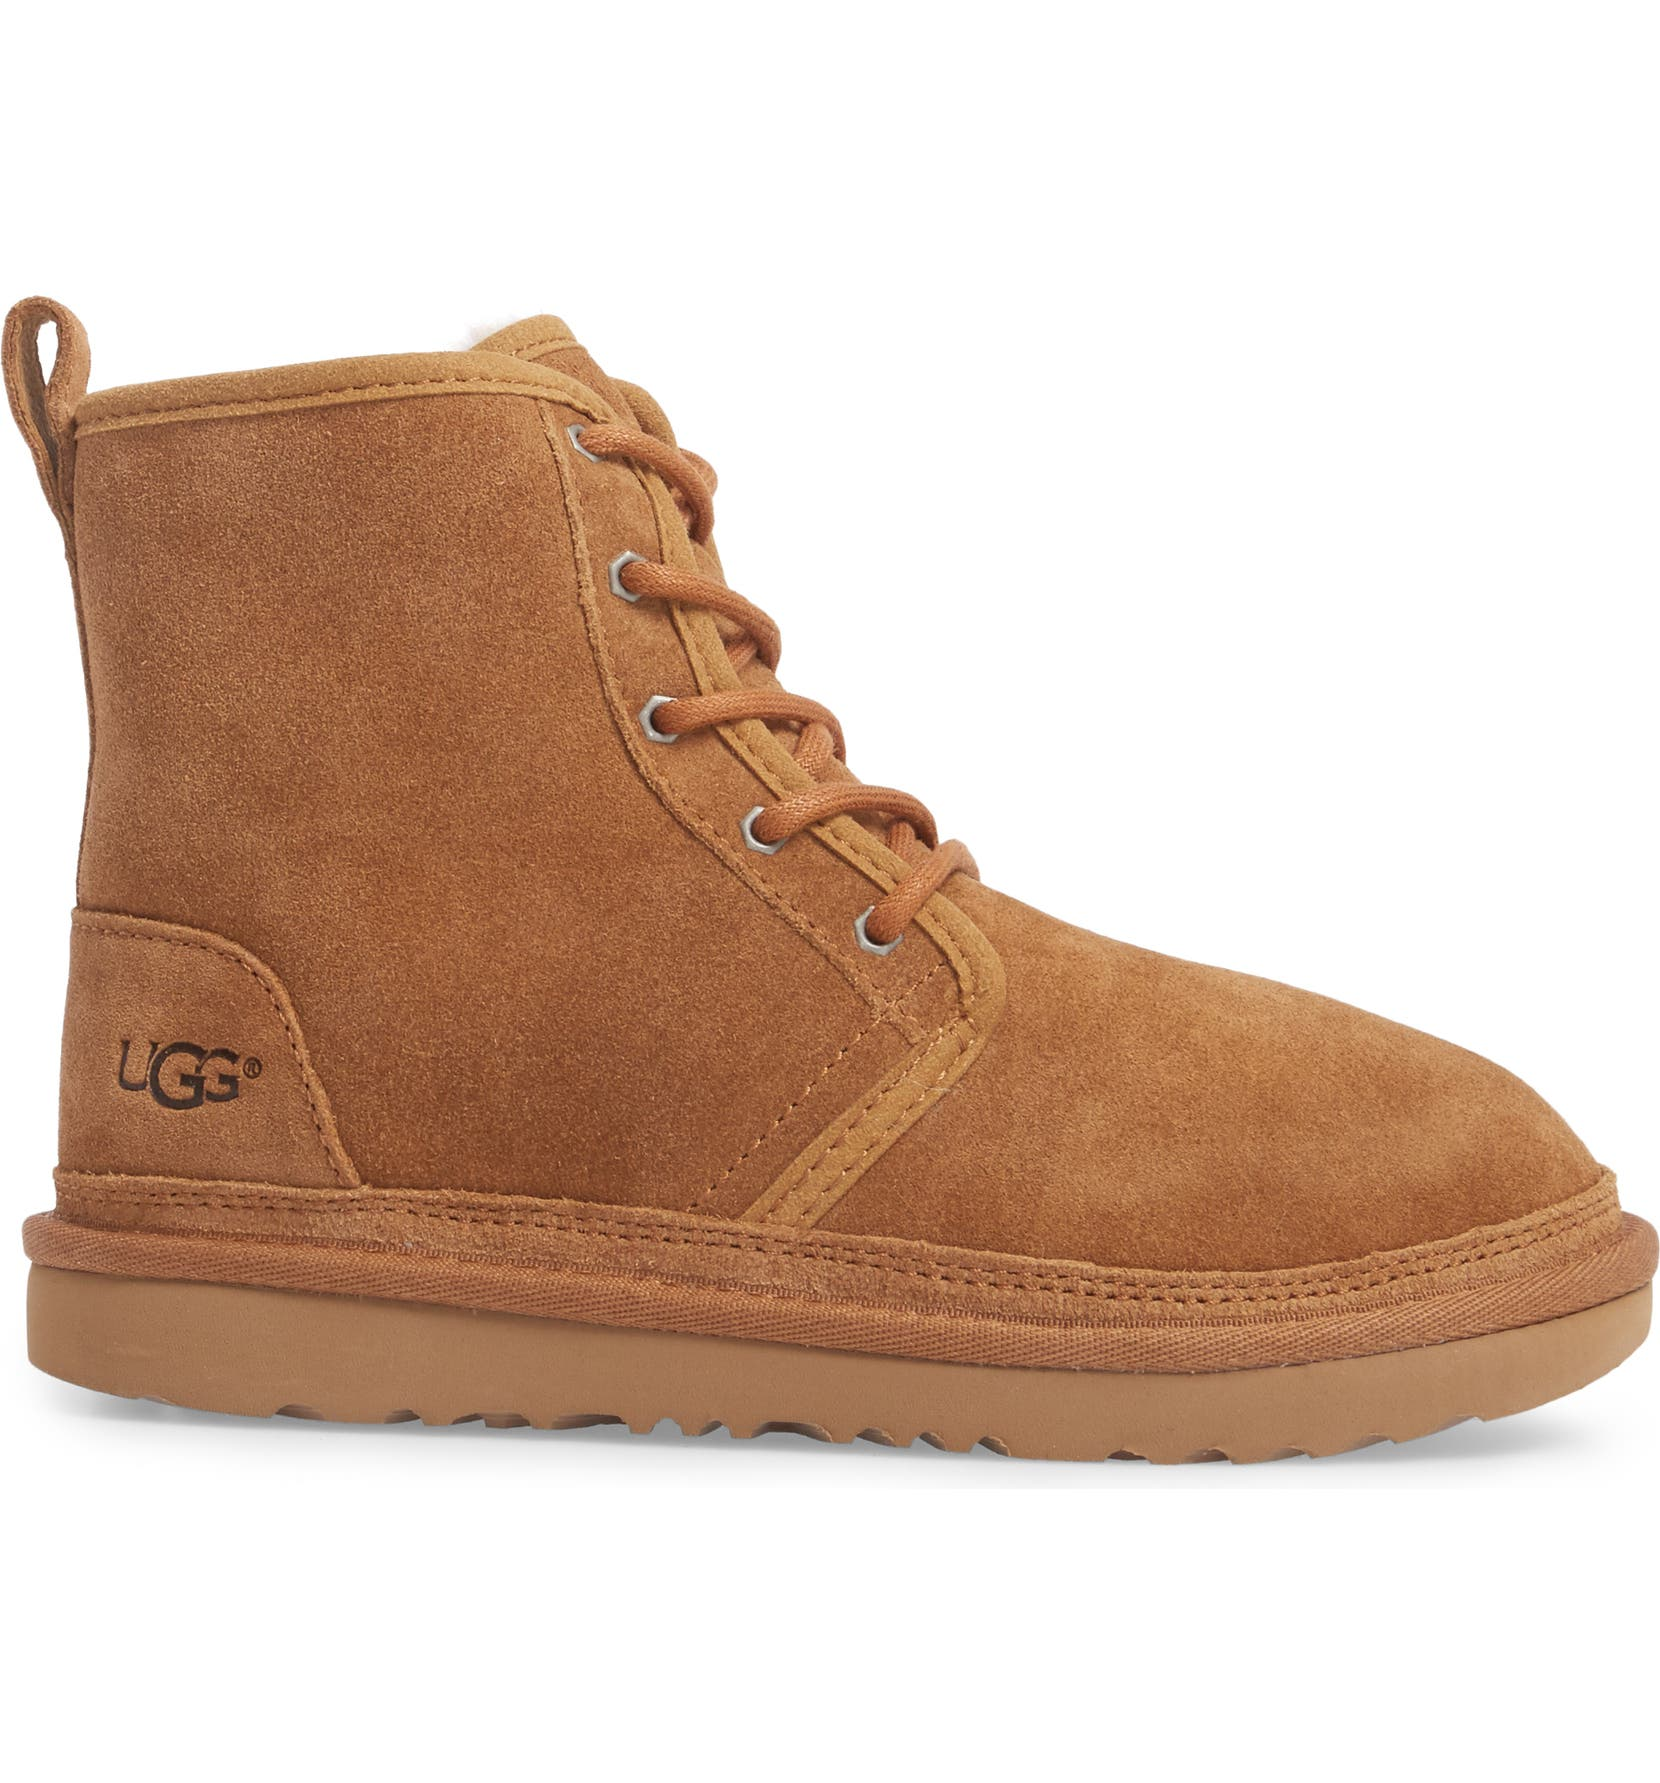 49b3f47a37f Harkley Lace-Up Boot